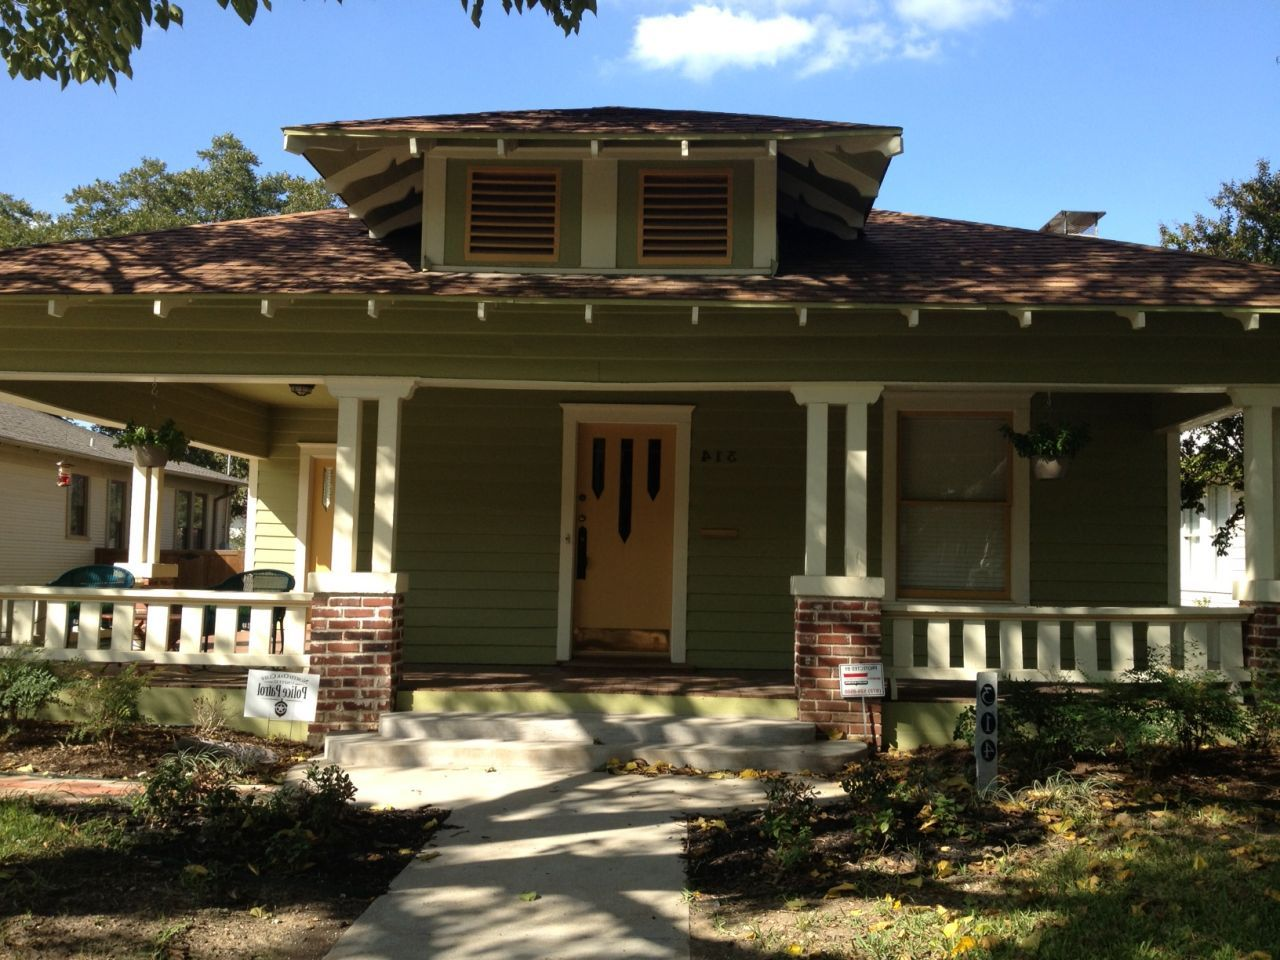 prairie style house design a frank lloyd wrights legacy house - Prairie Style Home Designs